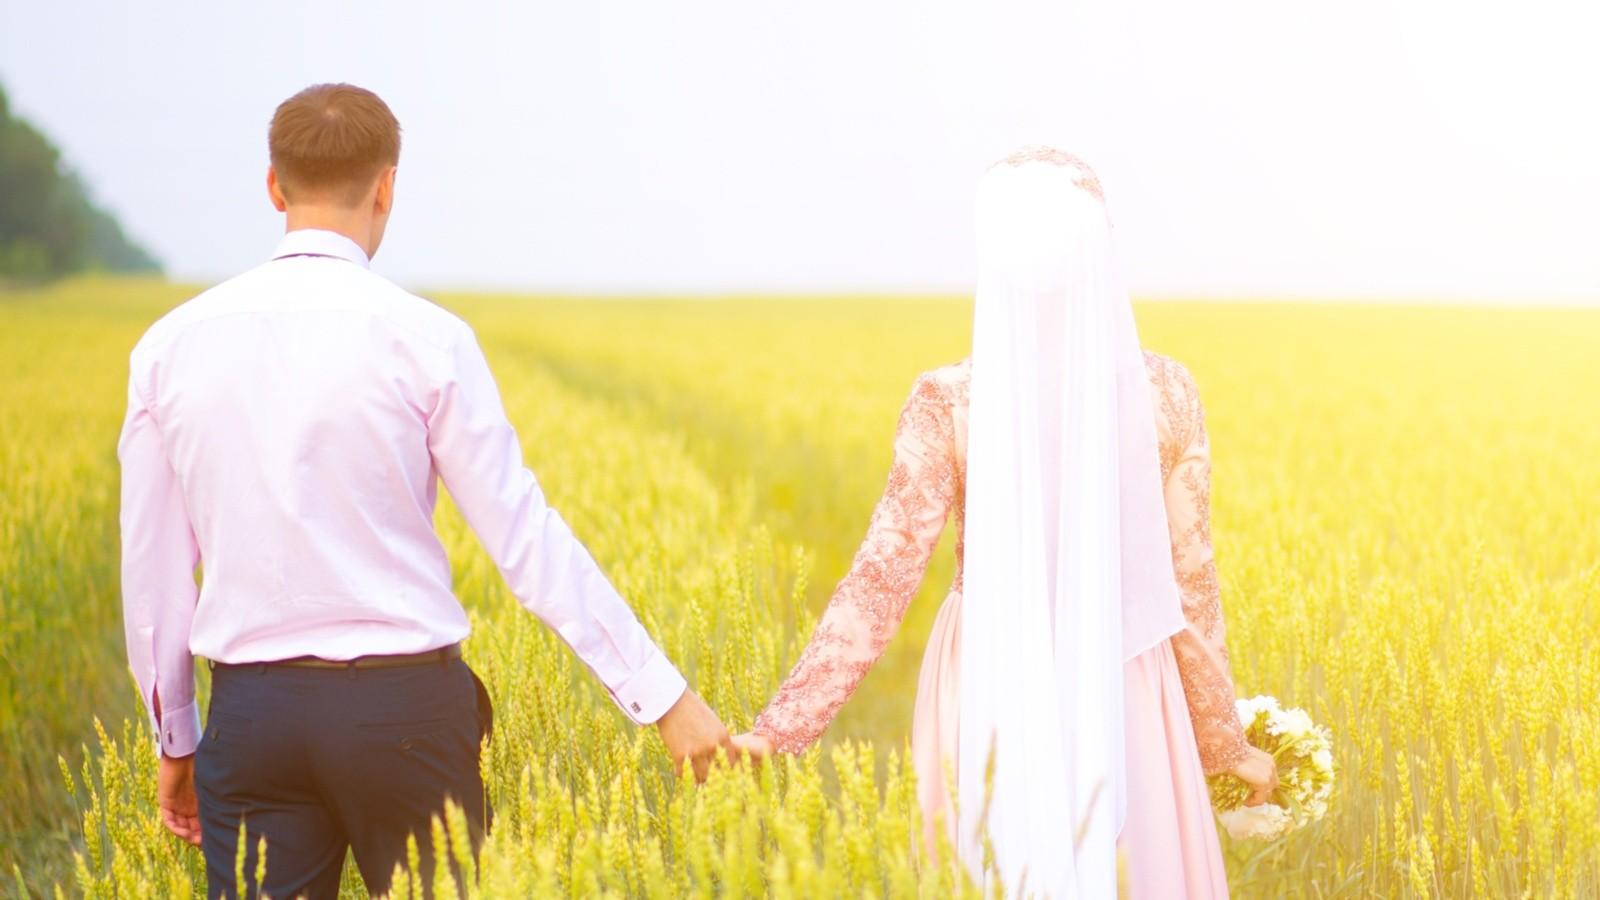 Senantiasa Mencintai Pasangan dalam Ketidaksempurnaan